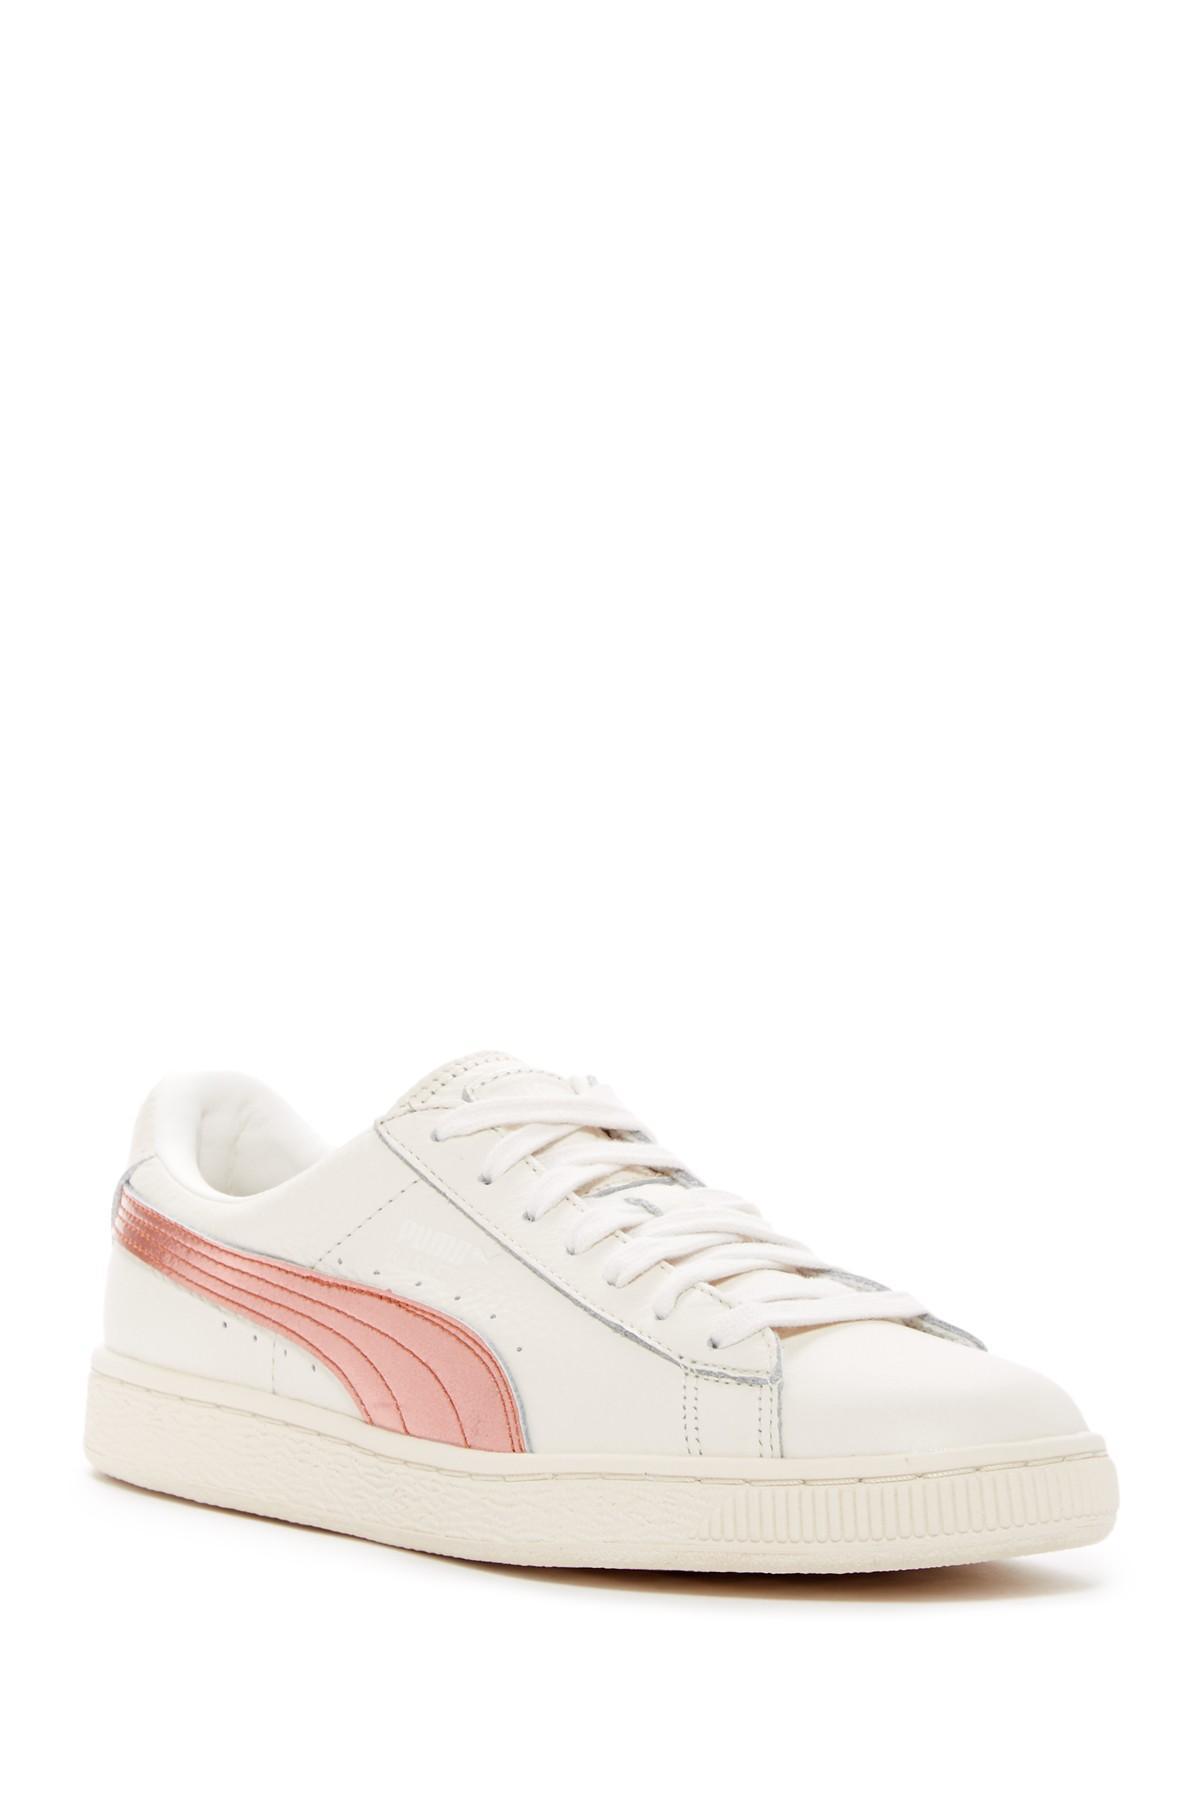 Lyst Puma Basket Classic Metallic Stripe Sneaker In White